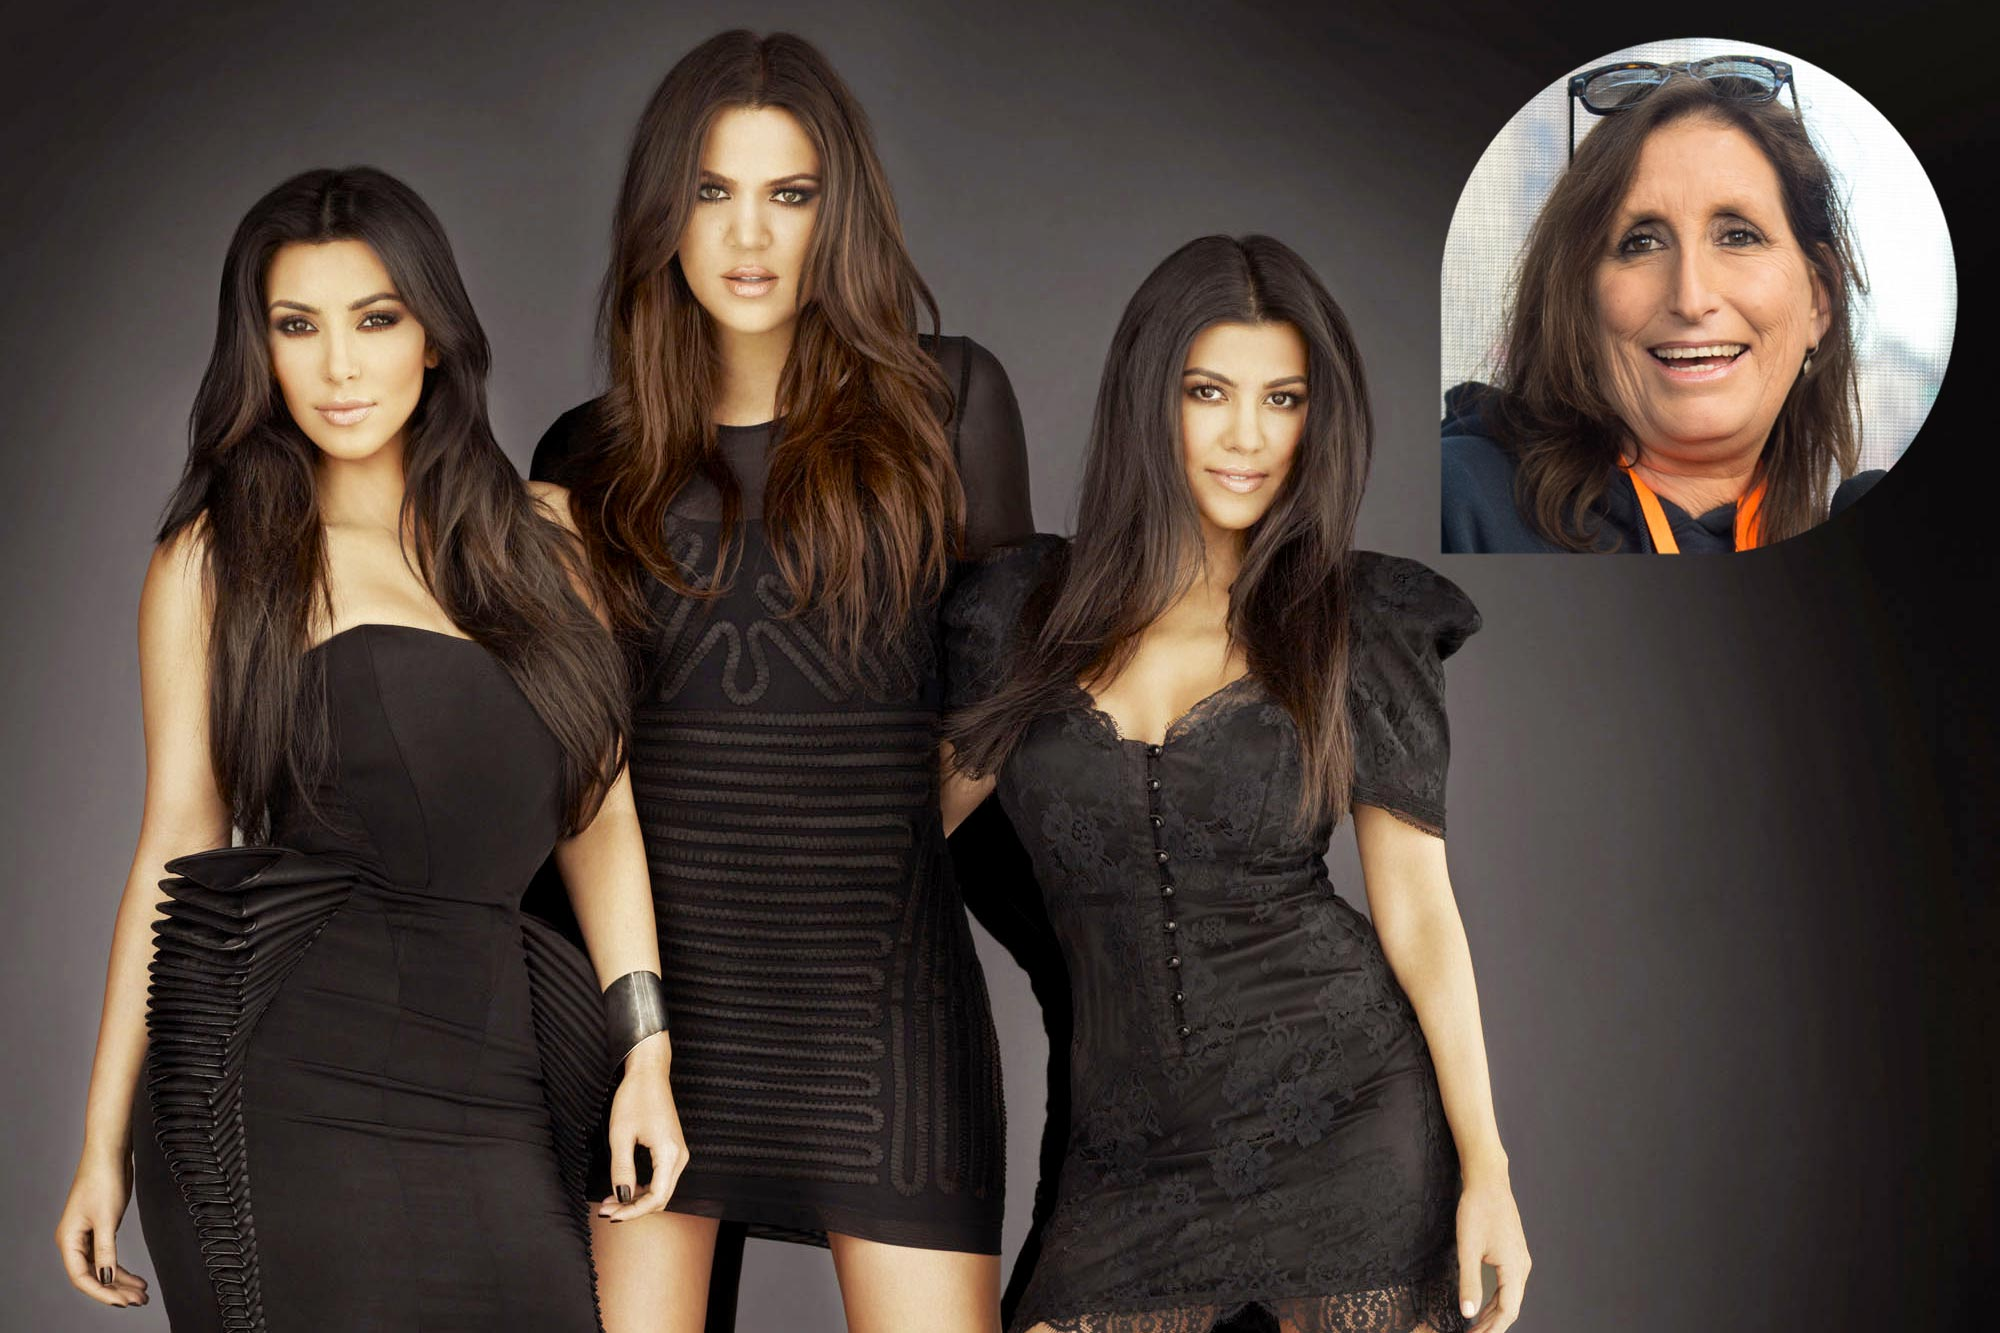 Keeping Up With The Kardashians; Deena Katz